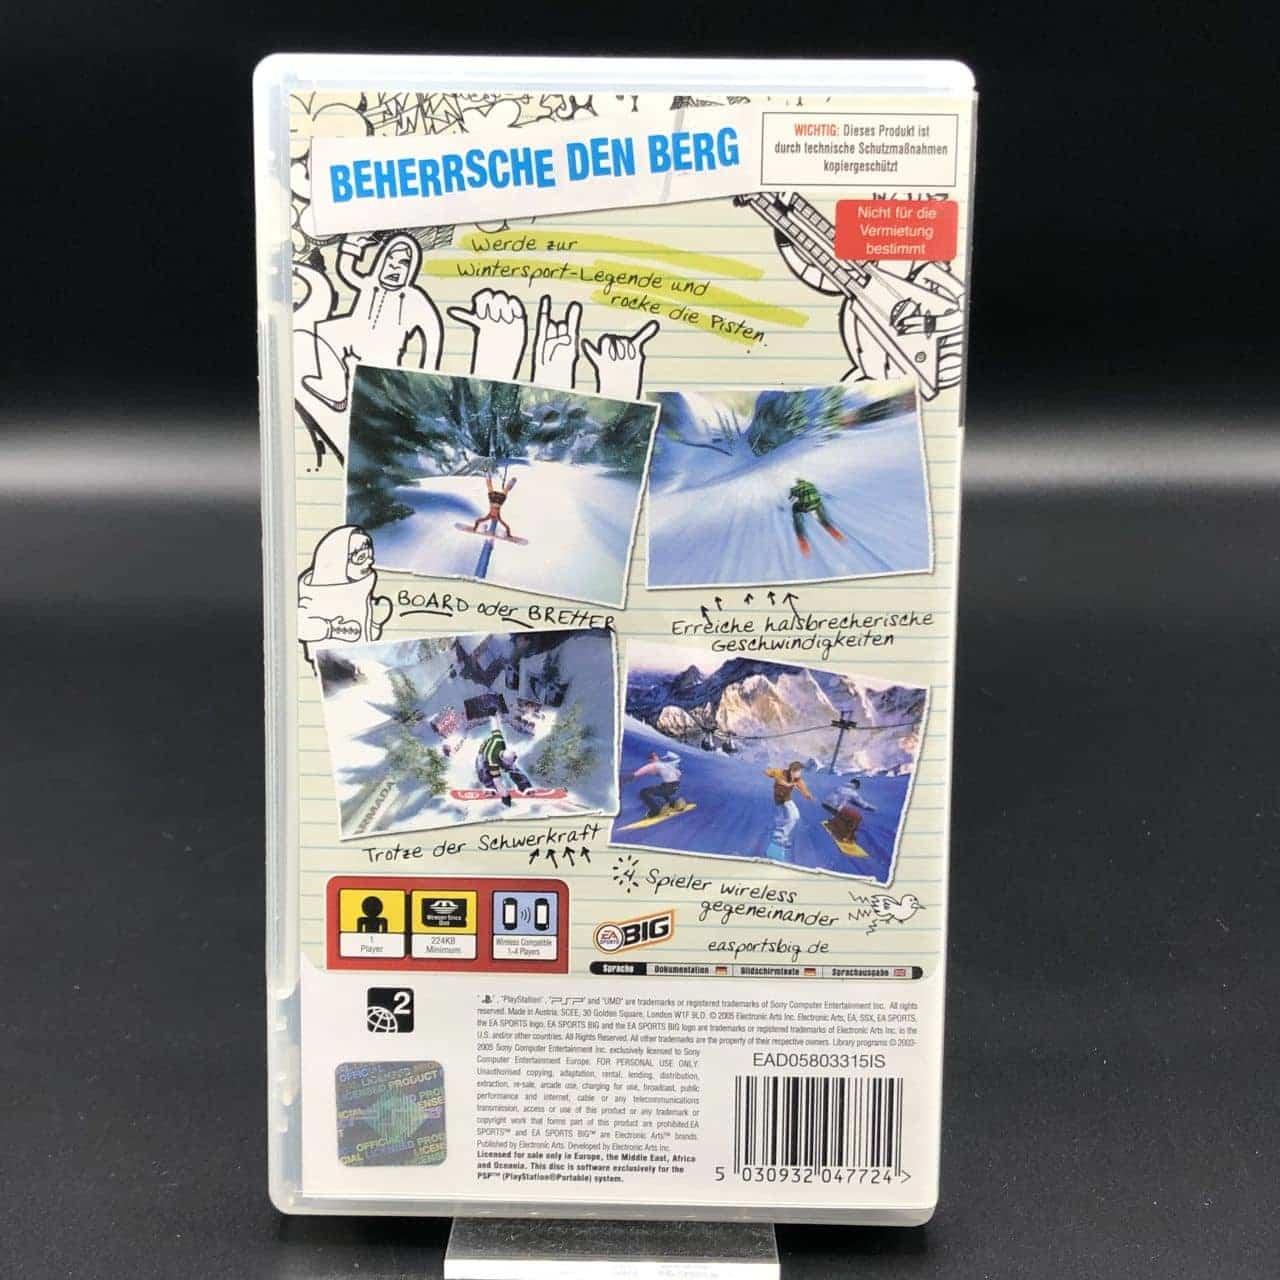 PSP SSX on Tour (Komplett) (Gut) Sony PlayStation Portable